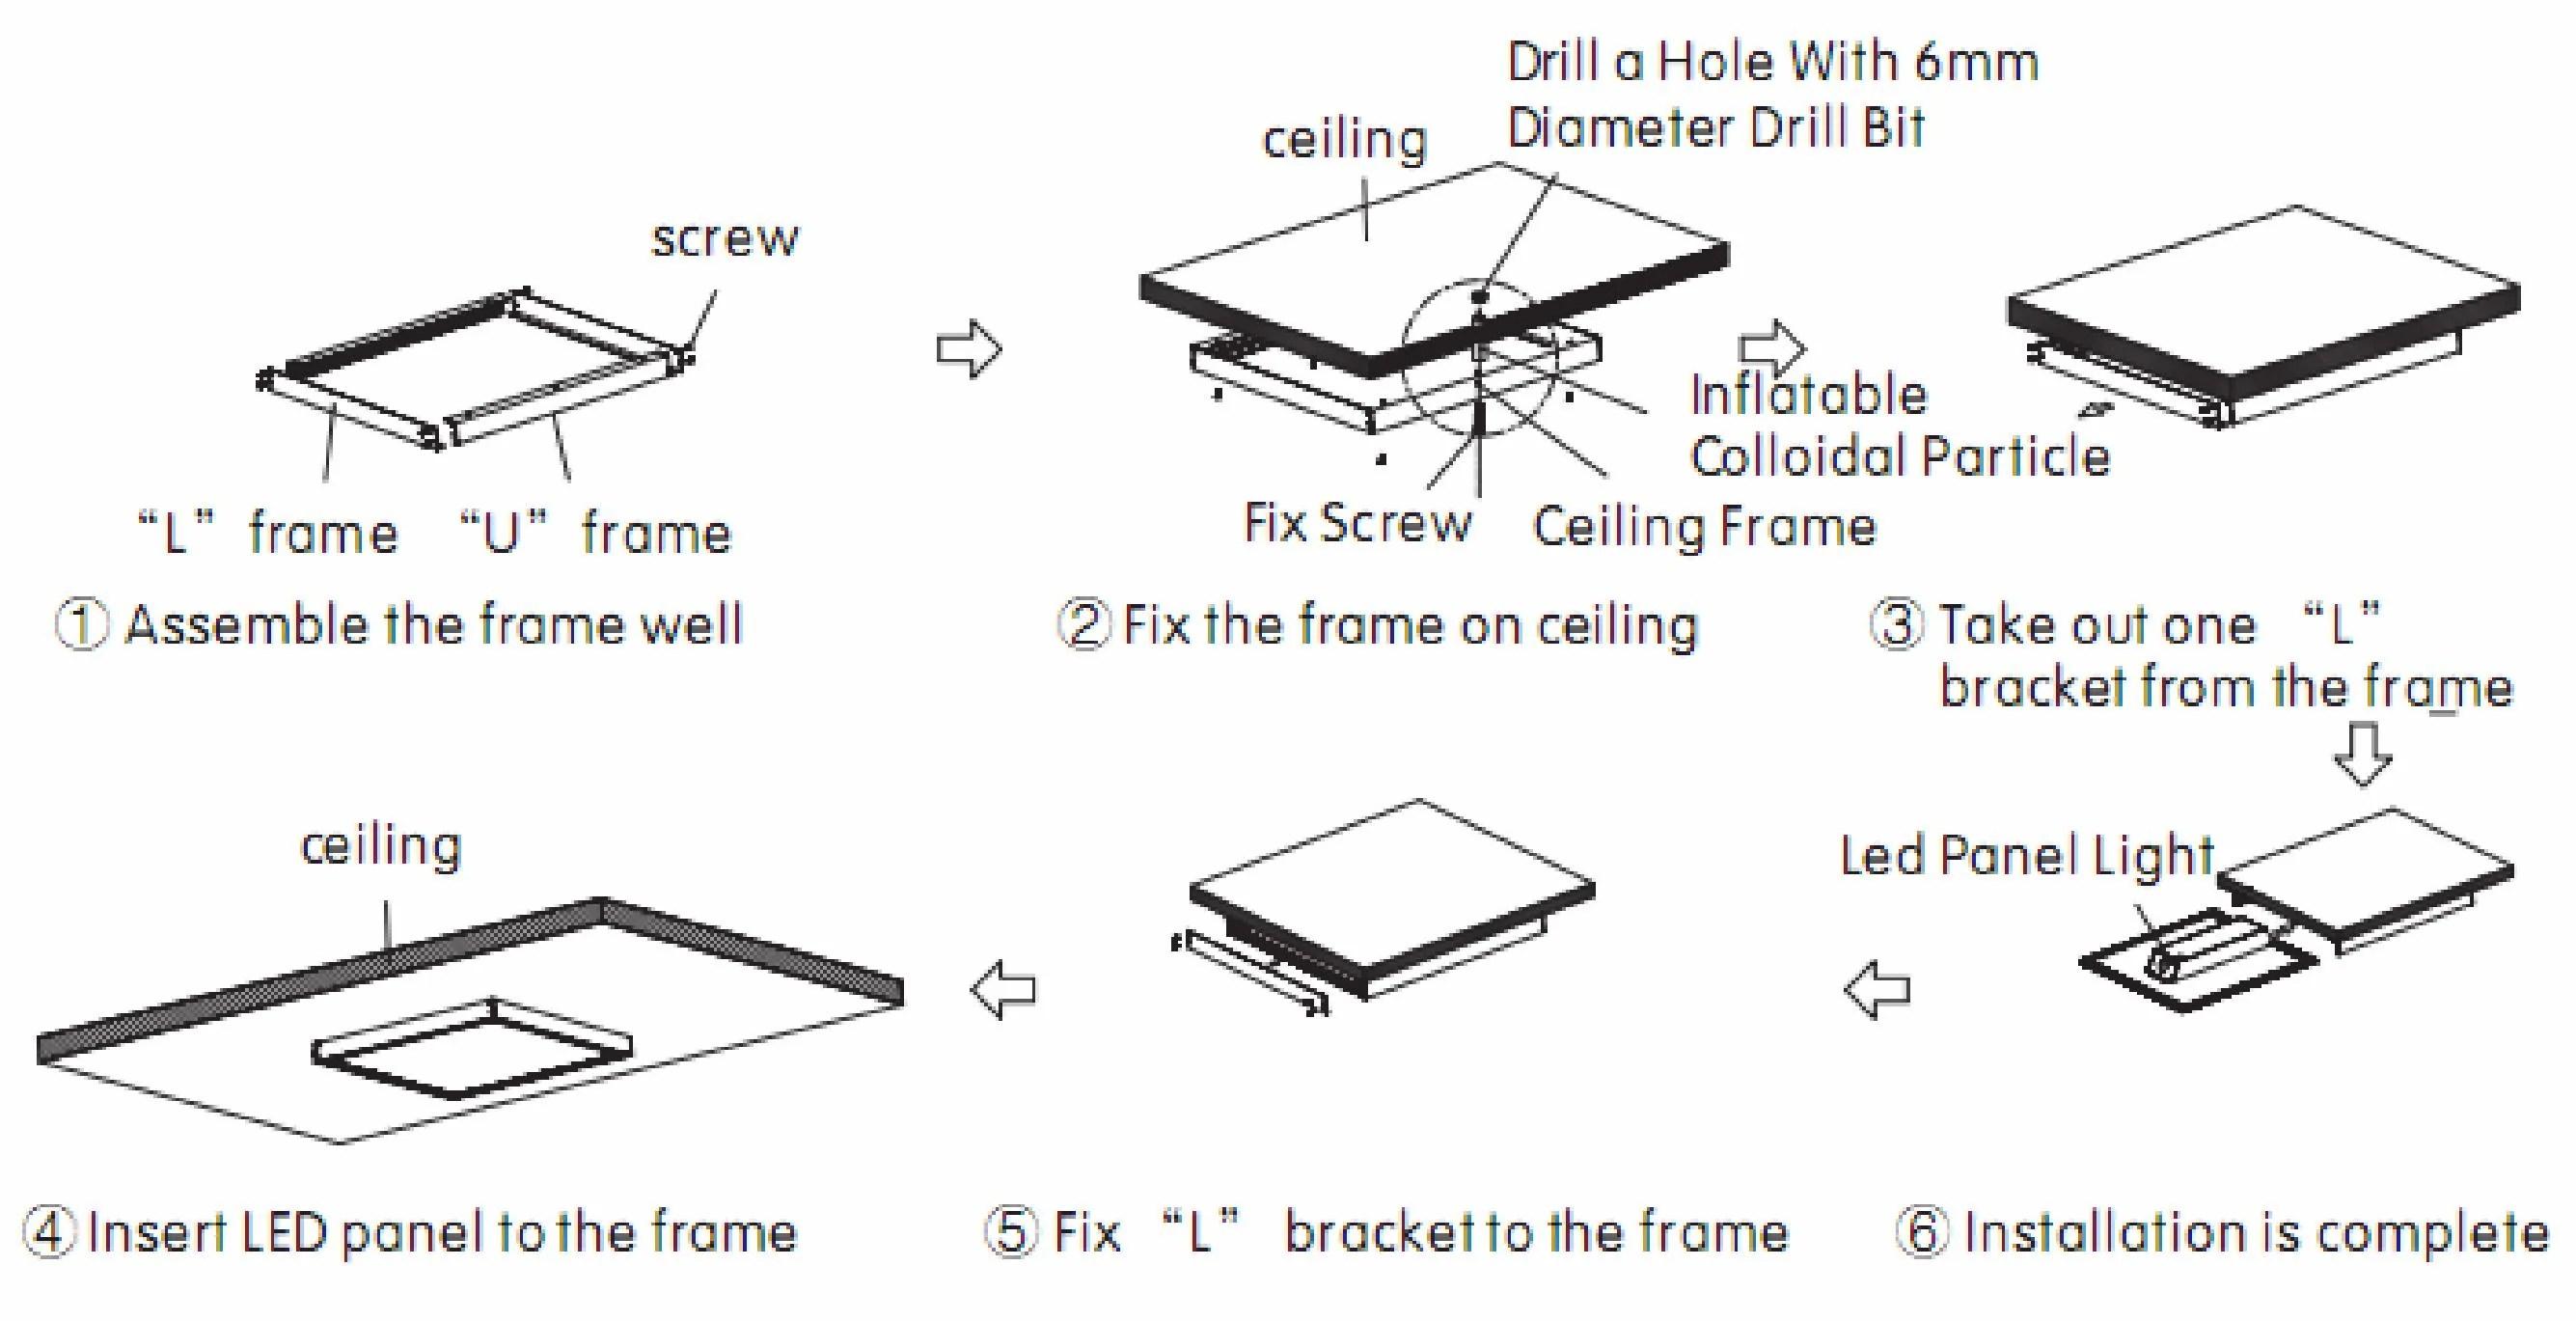 hight resolution of led panel light wiring diagram wiring diagram led panel light diagram led panel diagram wiring diagramled